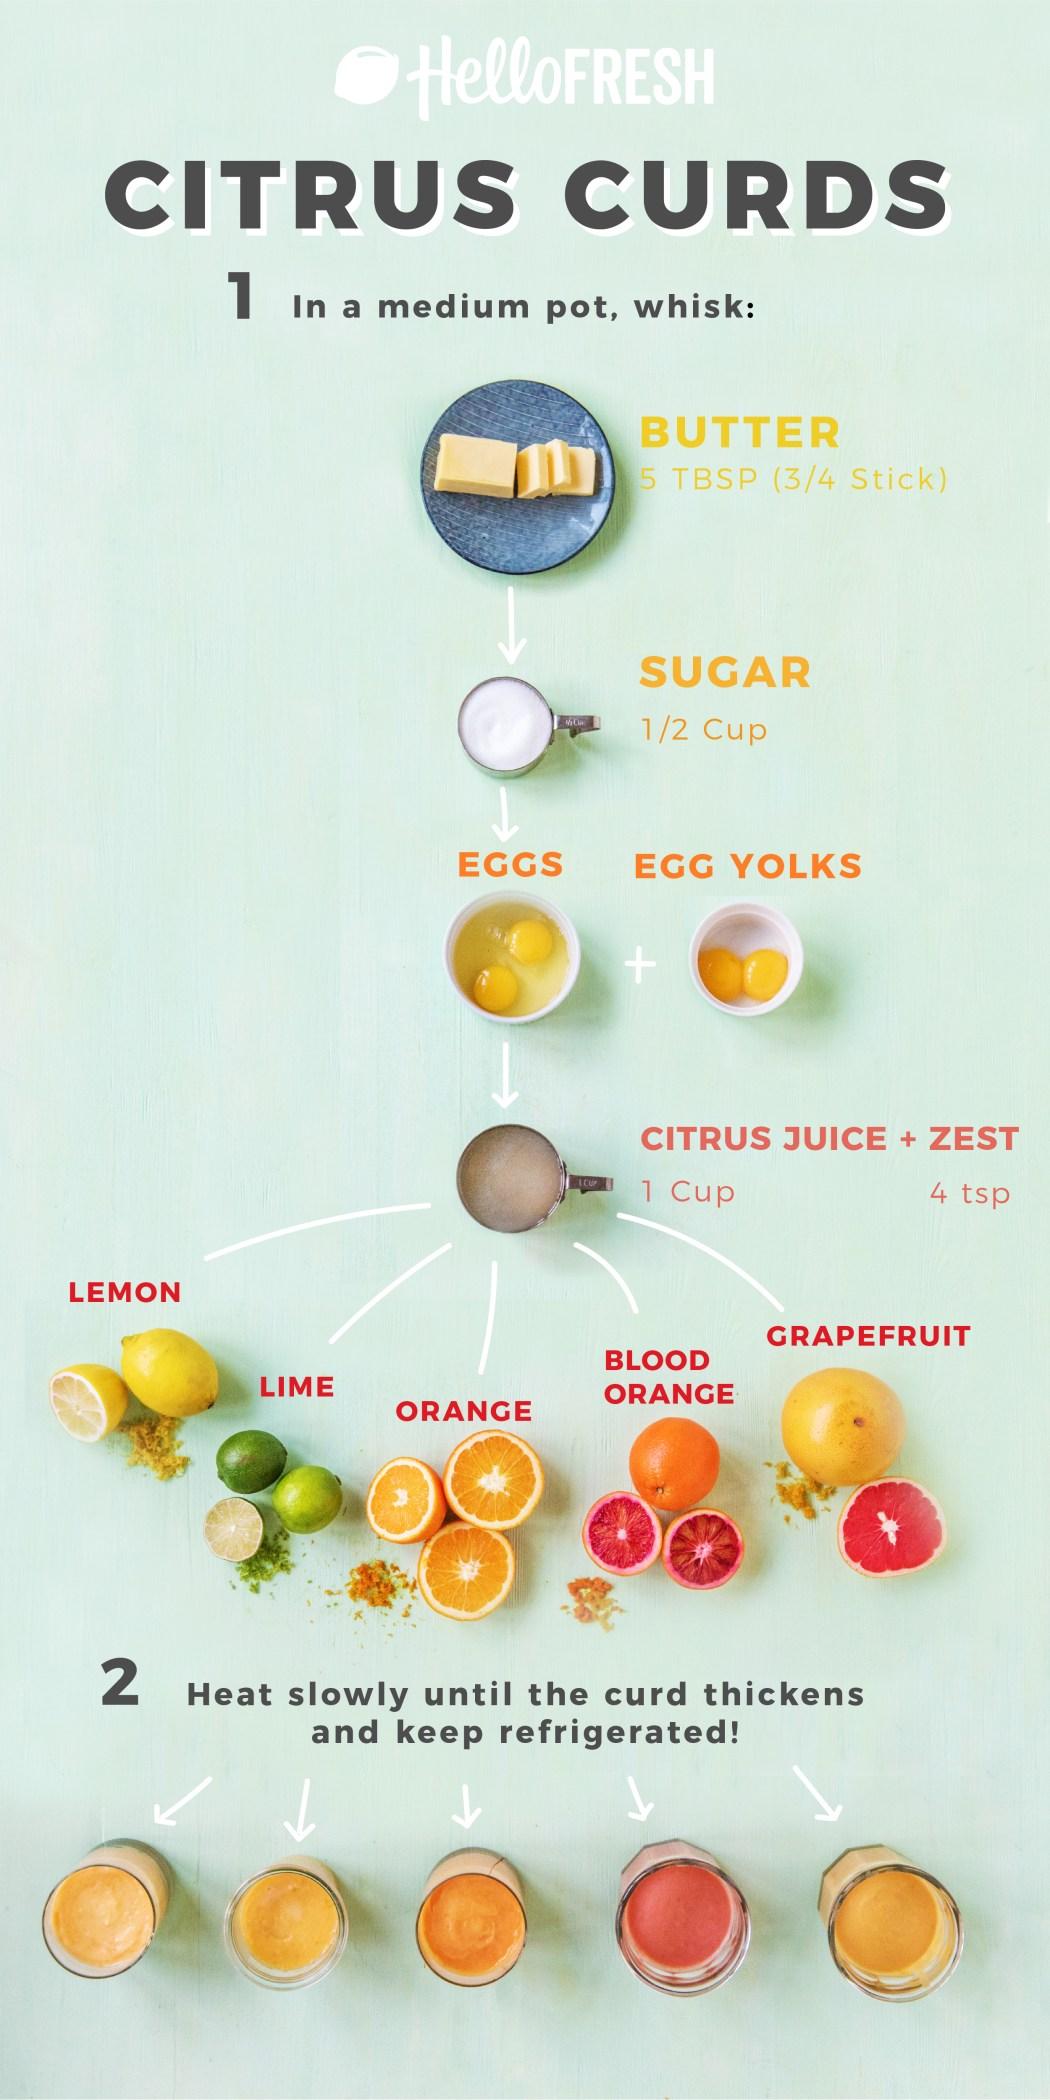 citrus curd-recipes-HelloFresh-US-infographic